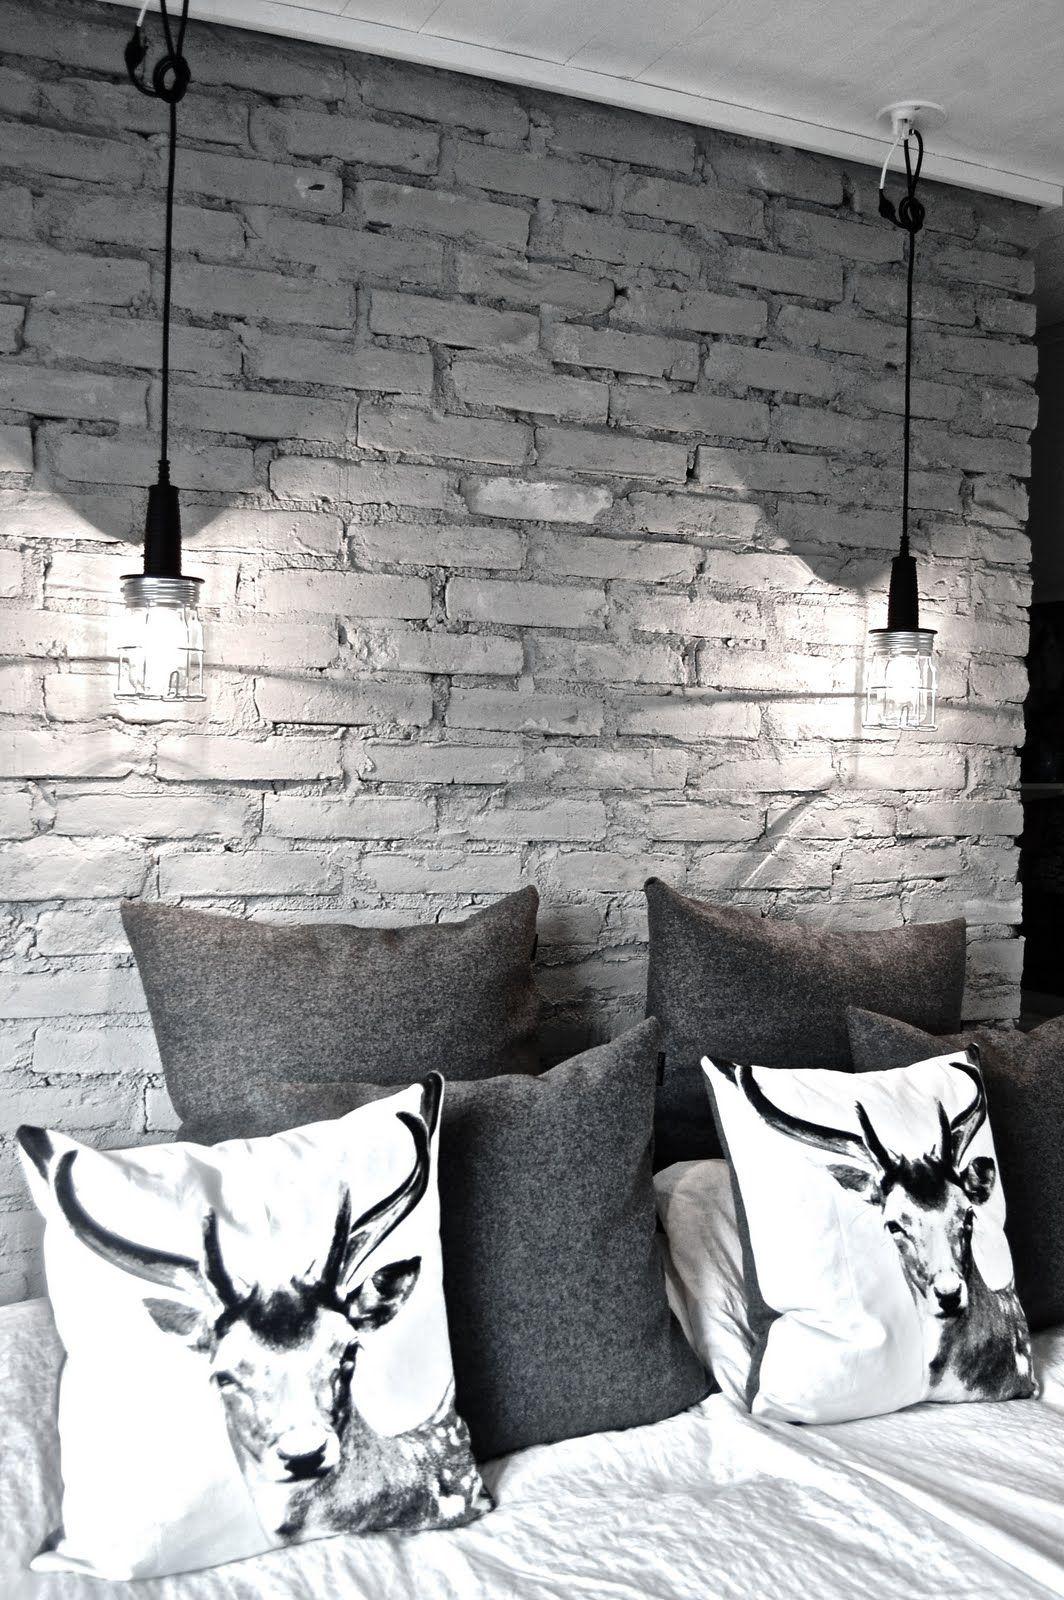 Detales Namutekstile Pilka Interjeras Interjeropatarimai Pagalvele Plytusiena Miegamasis Brick Wall Bedroom Brick Bedroom White Brick Walls